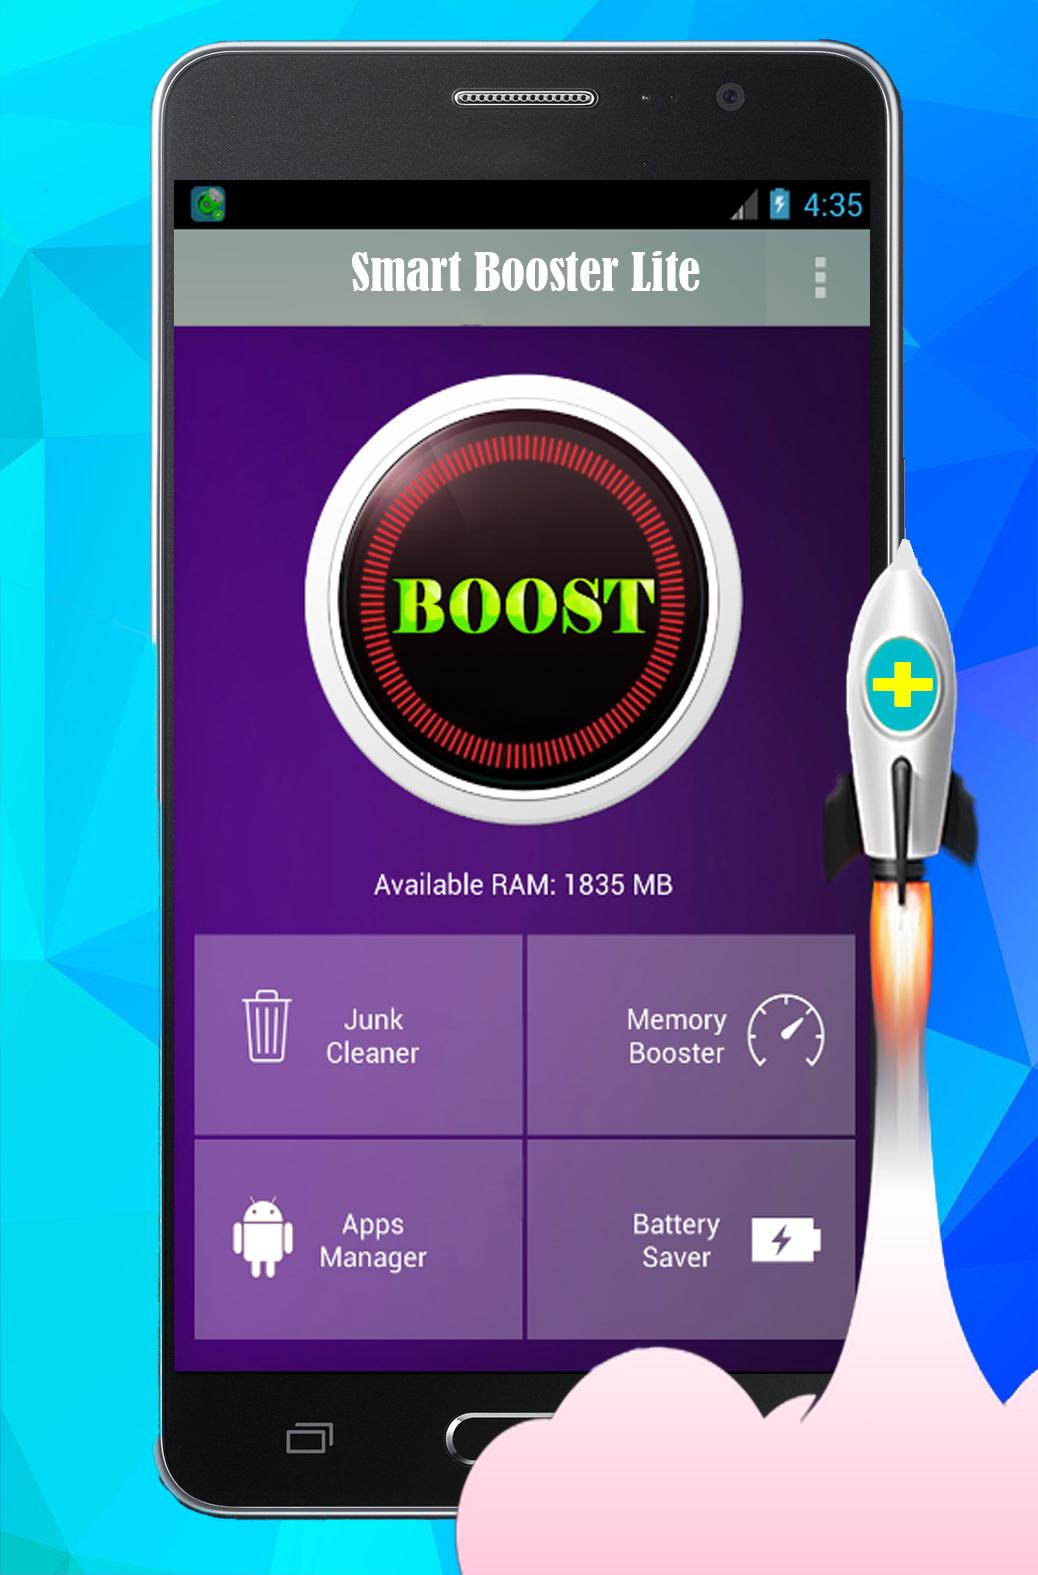 Smart Booster Lite